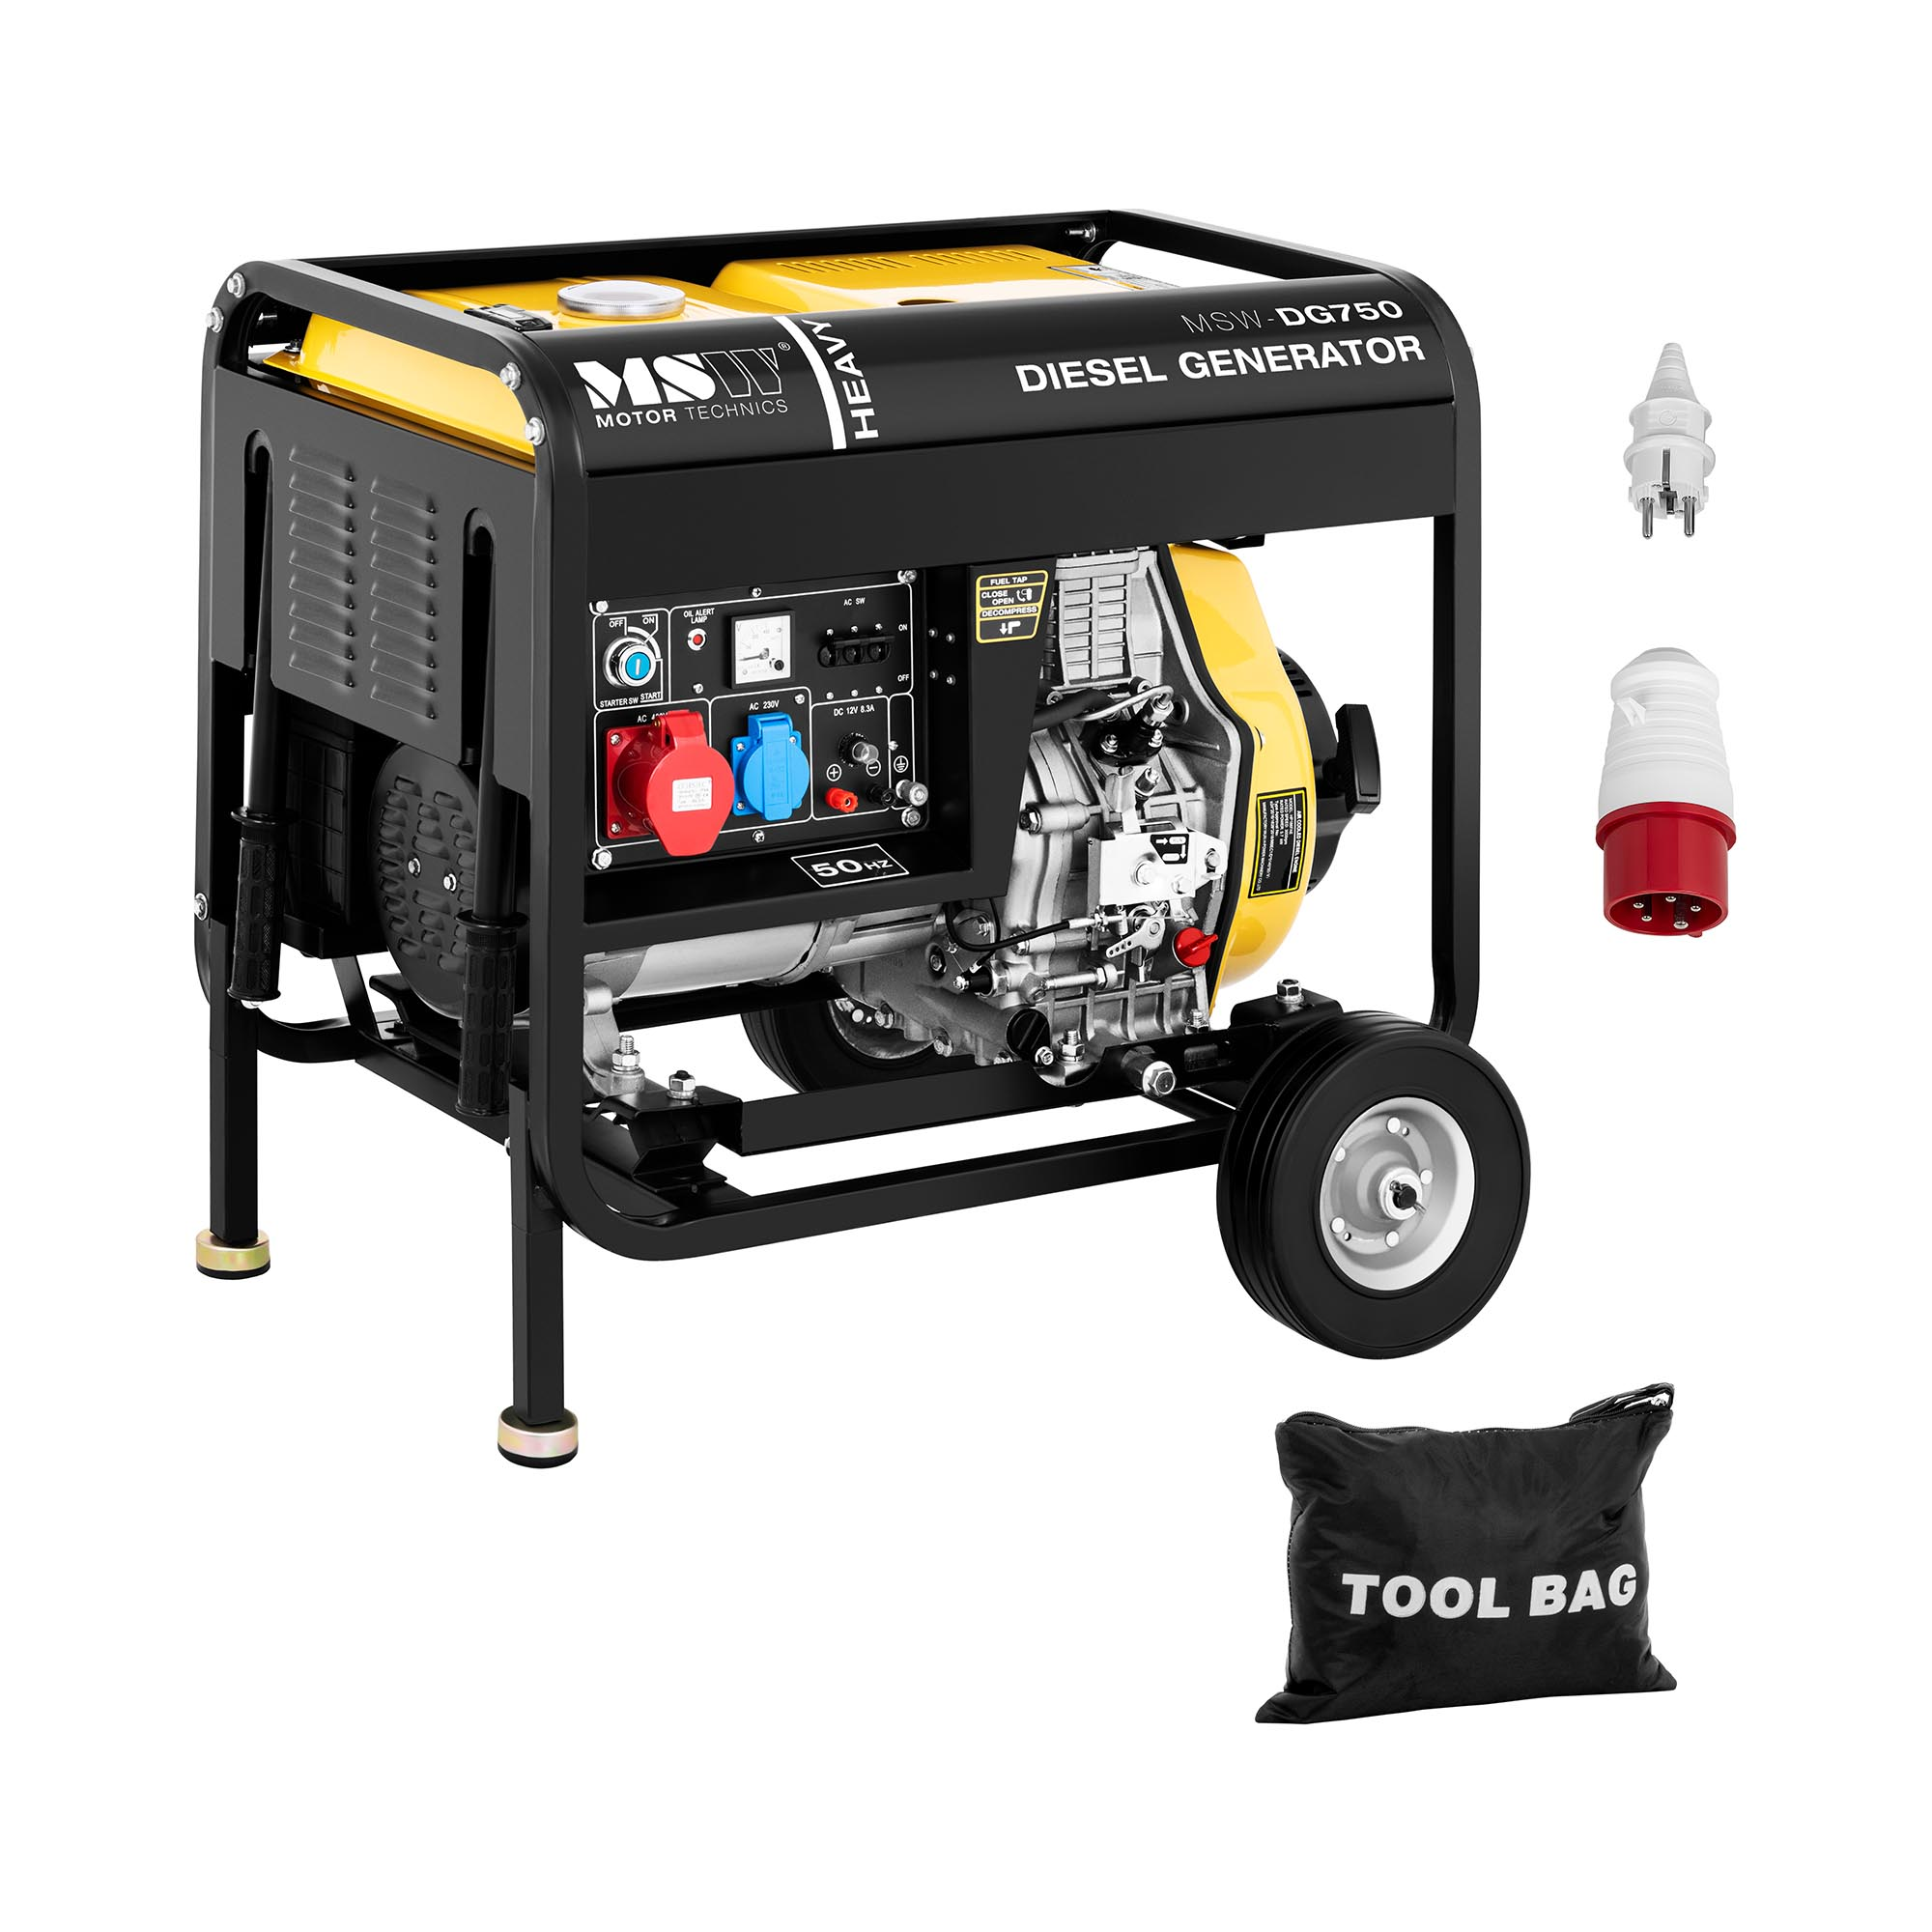 MSW Notstromaggregat Diesel - 4.400 W - 12,5 L - 230/400 V - mobil 10061191